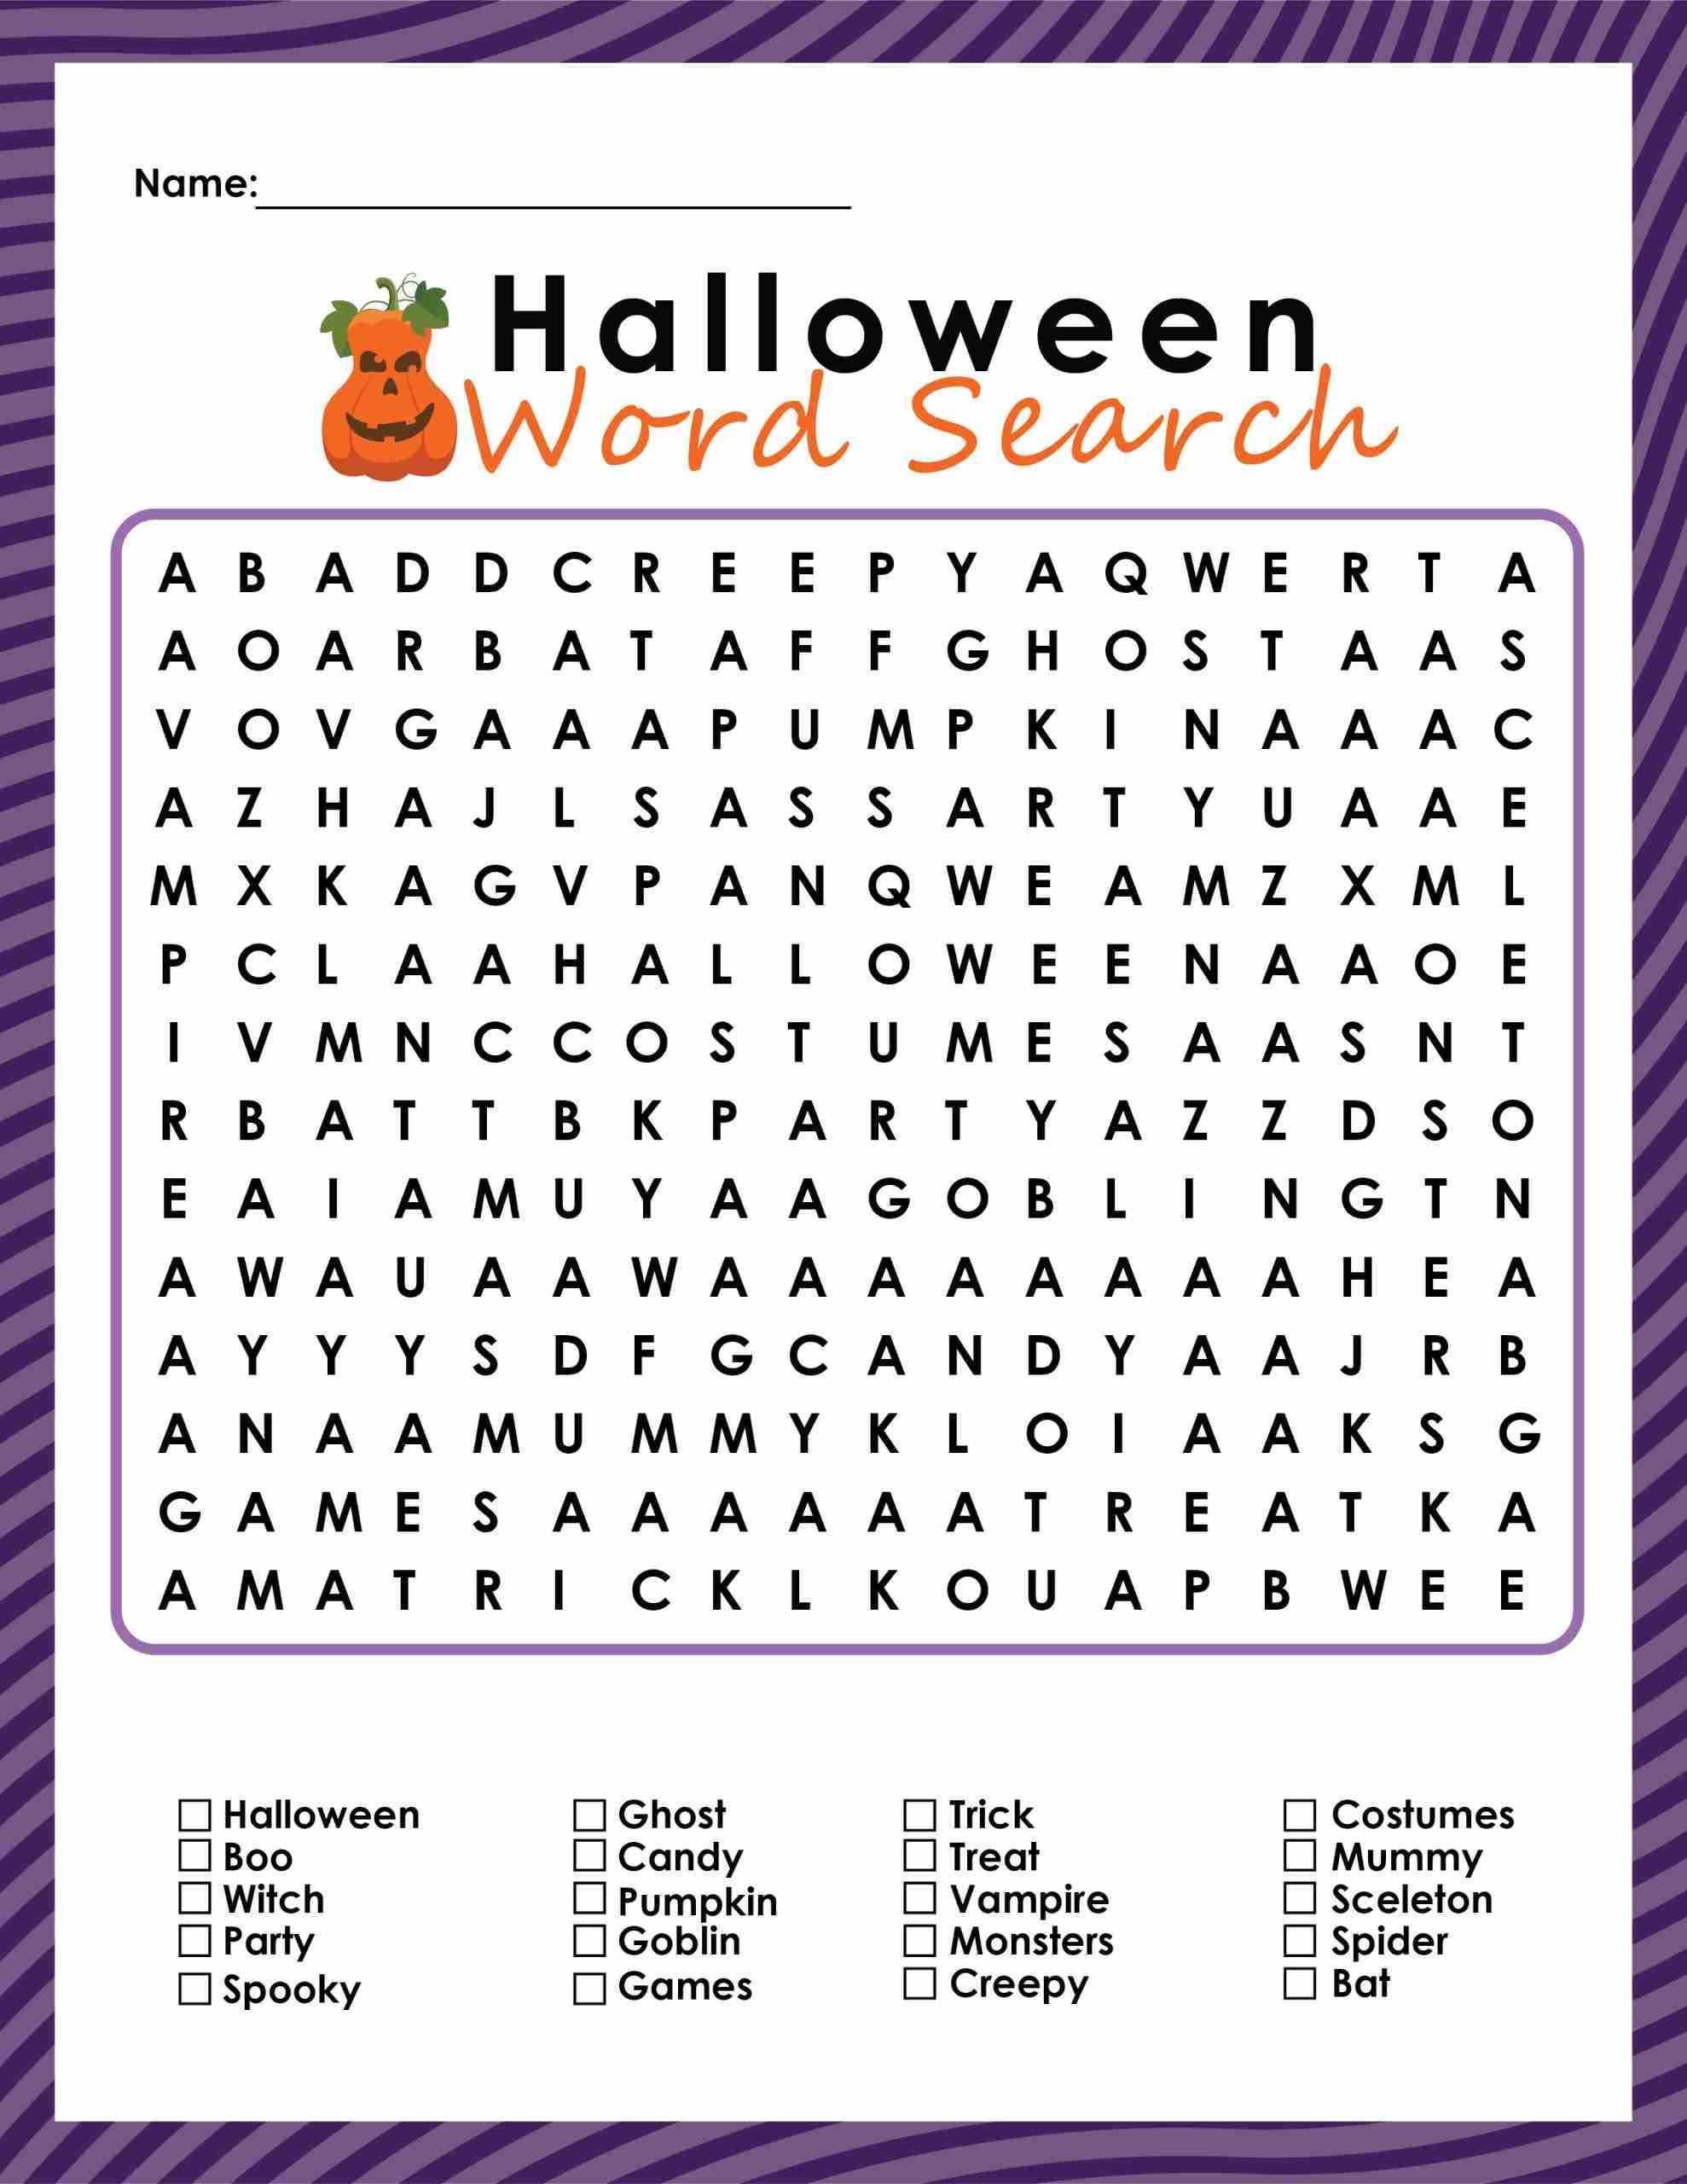 halloween word search, halloween prints, halloween fun, free printables school halloween party, free halloween printables